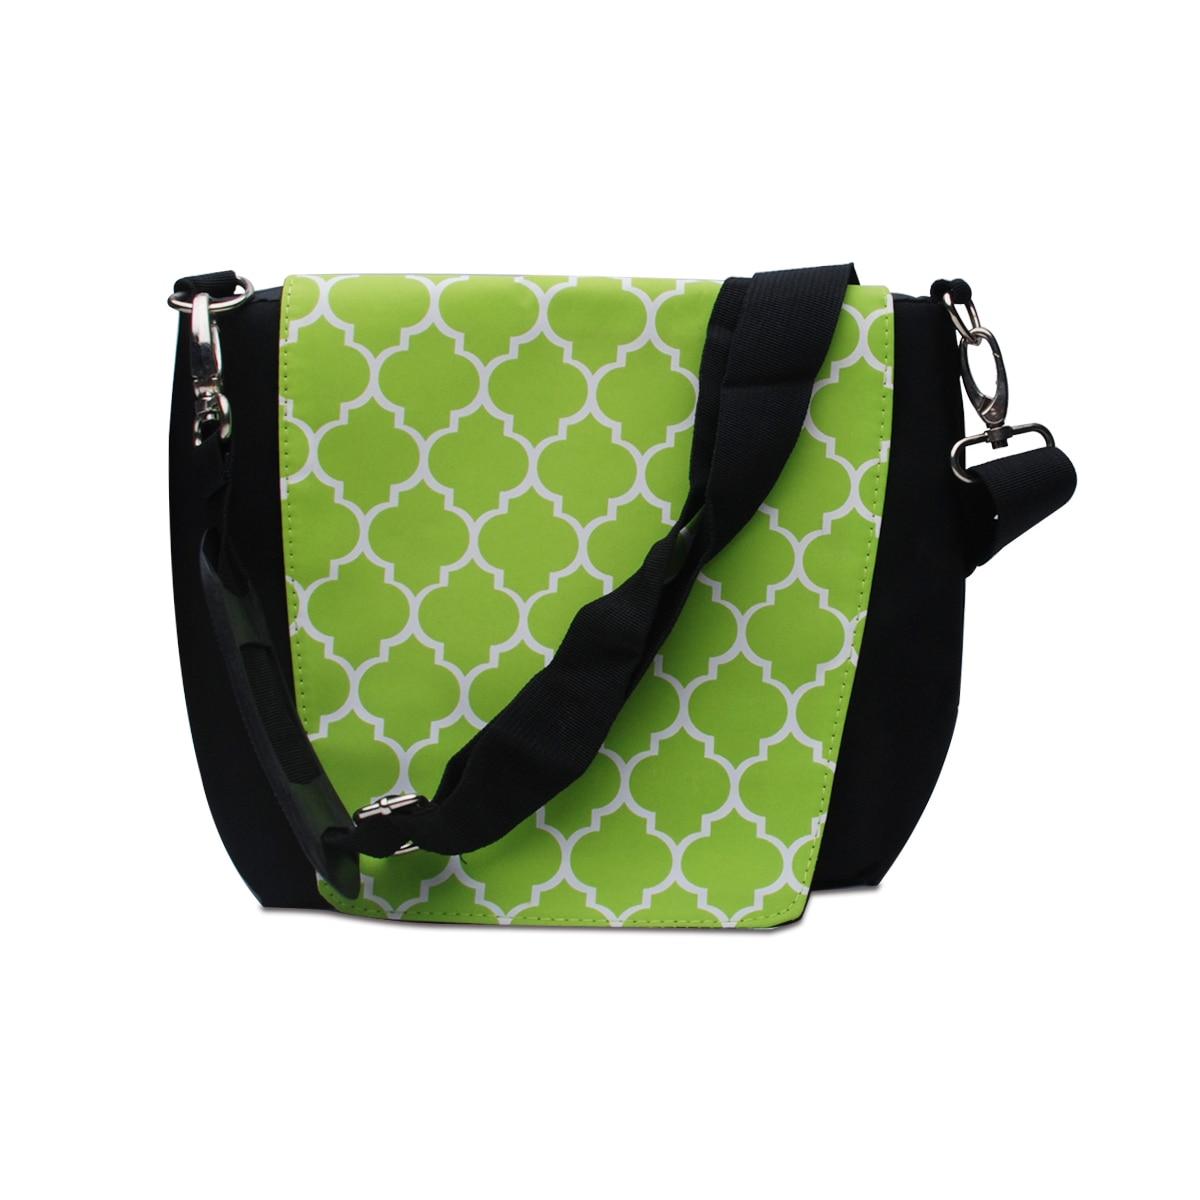 Retail Quatrefoil Camera Bag DOM113027 Travelling and Photography Shoulder Bag with Zipper Belt Lock